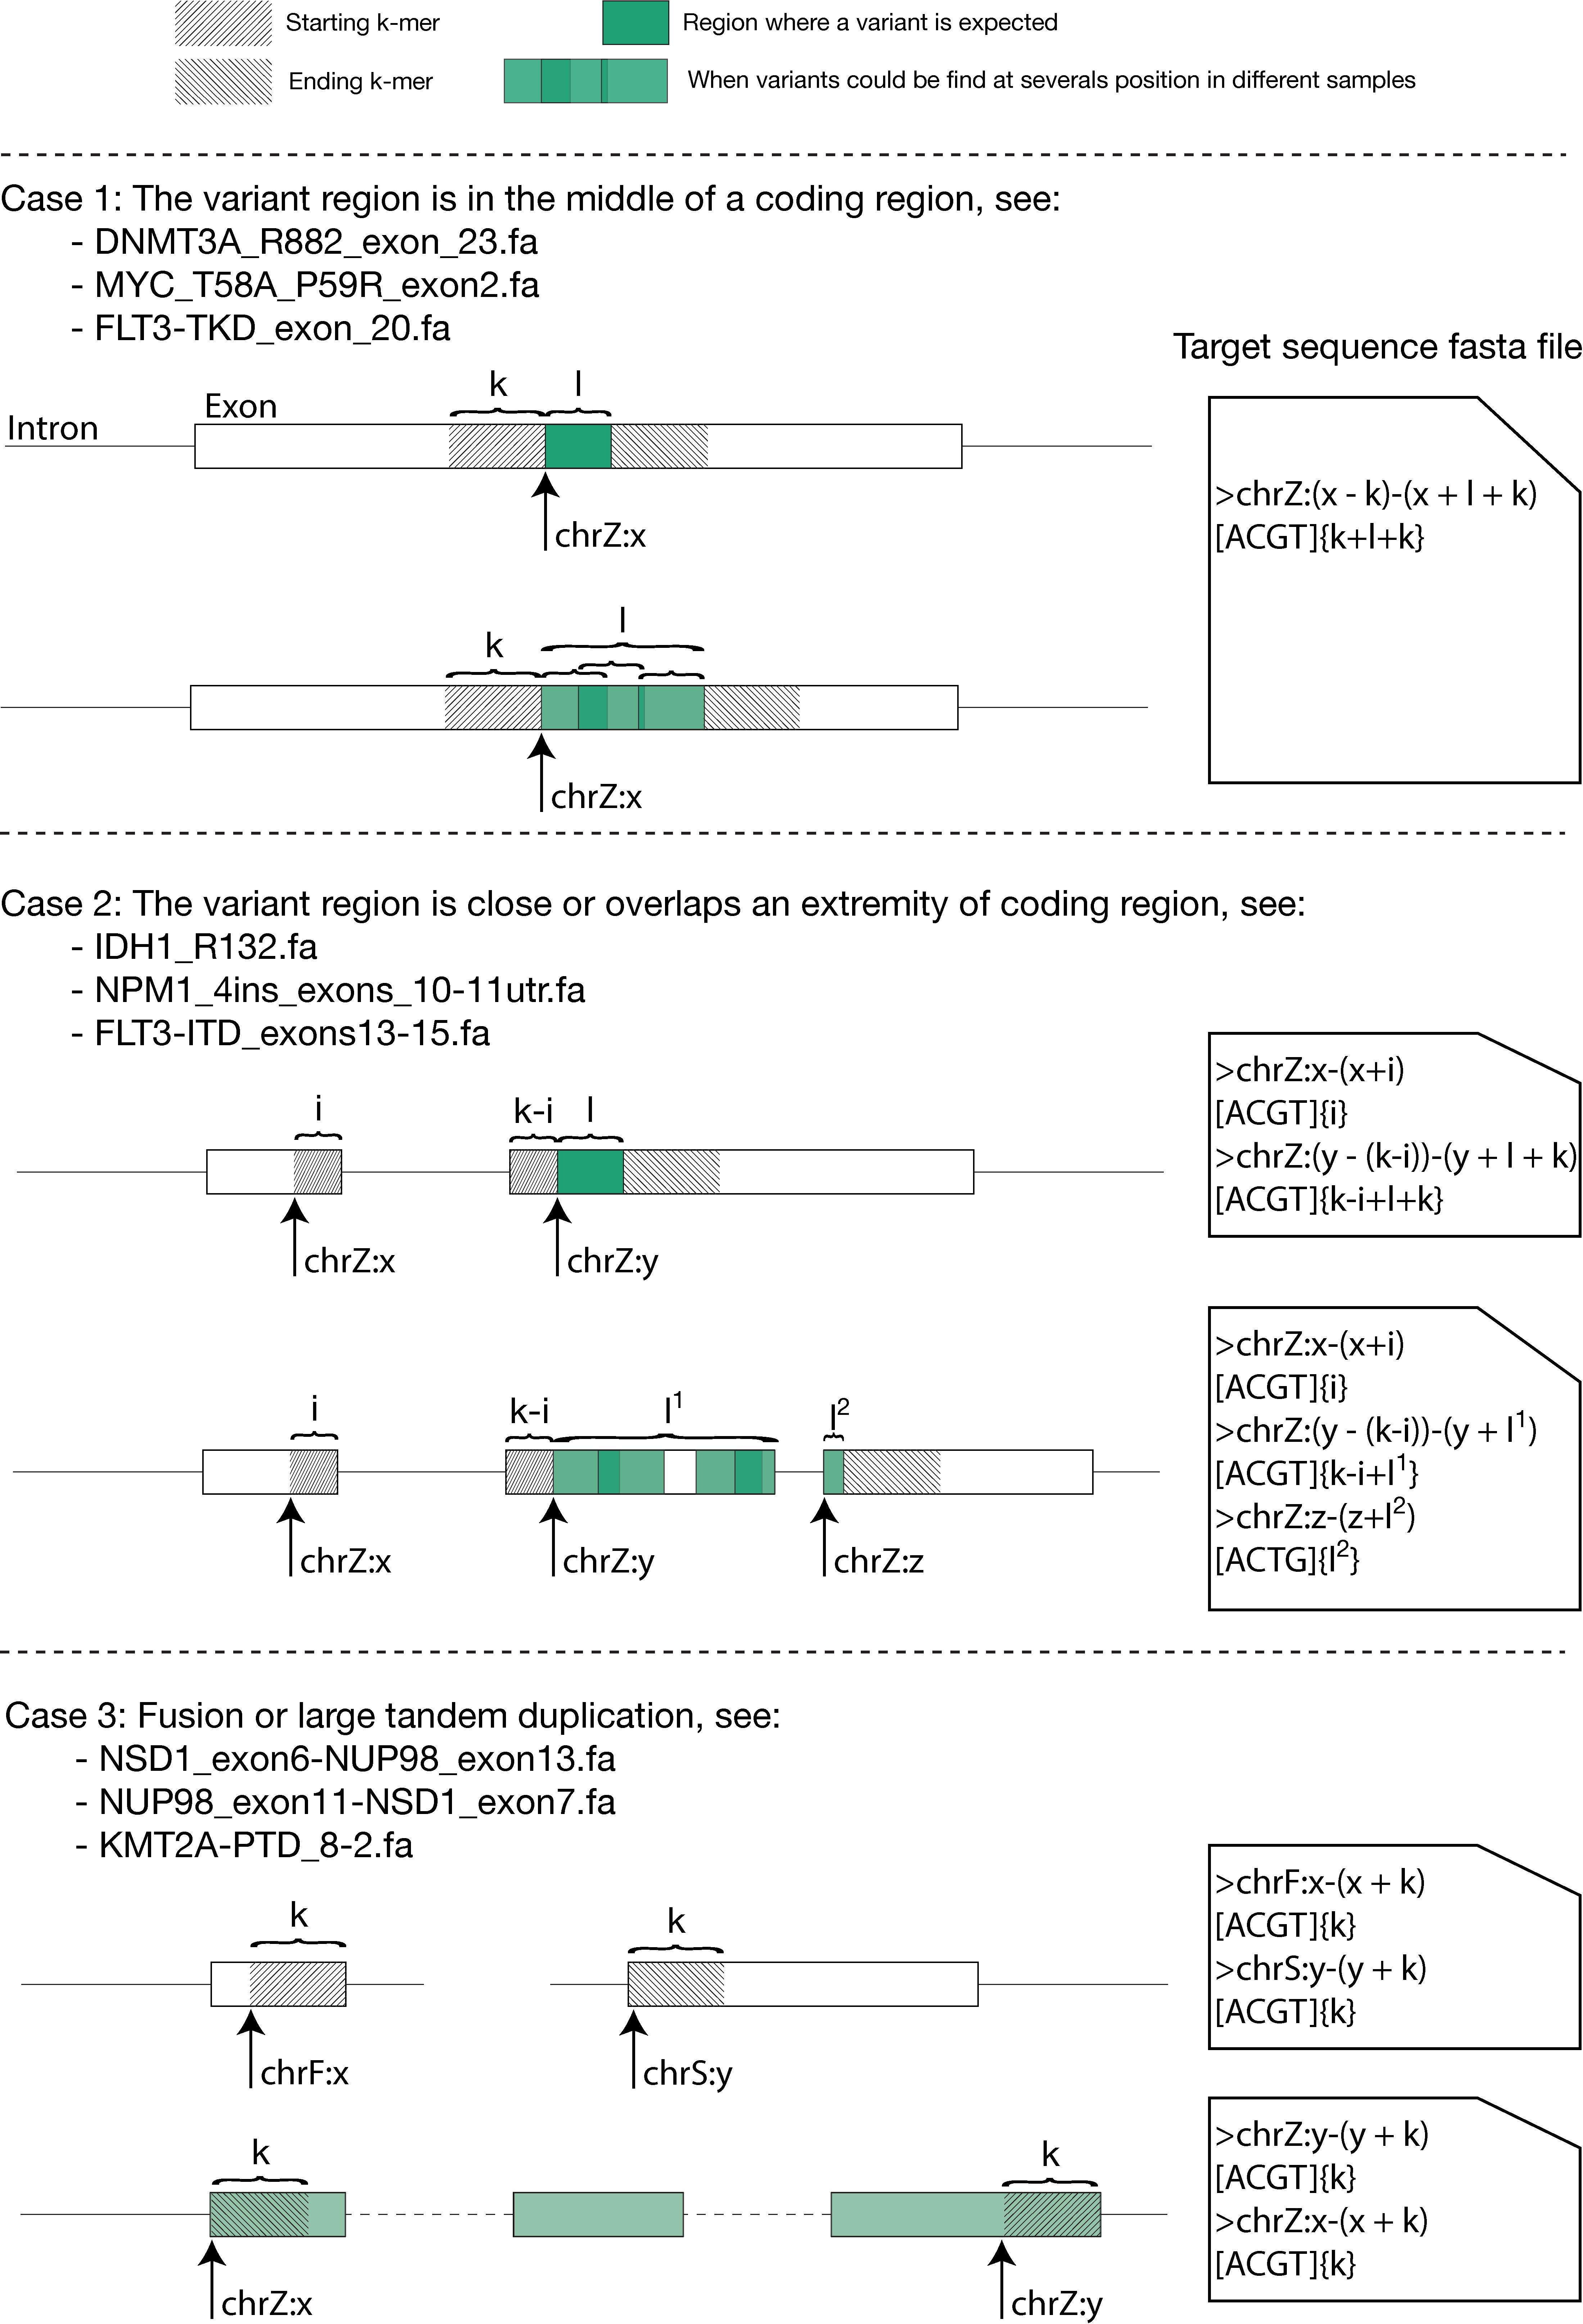 https://github.com/iric-soft/km/blob/master/data/figure/doc_target_sequence.png